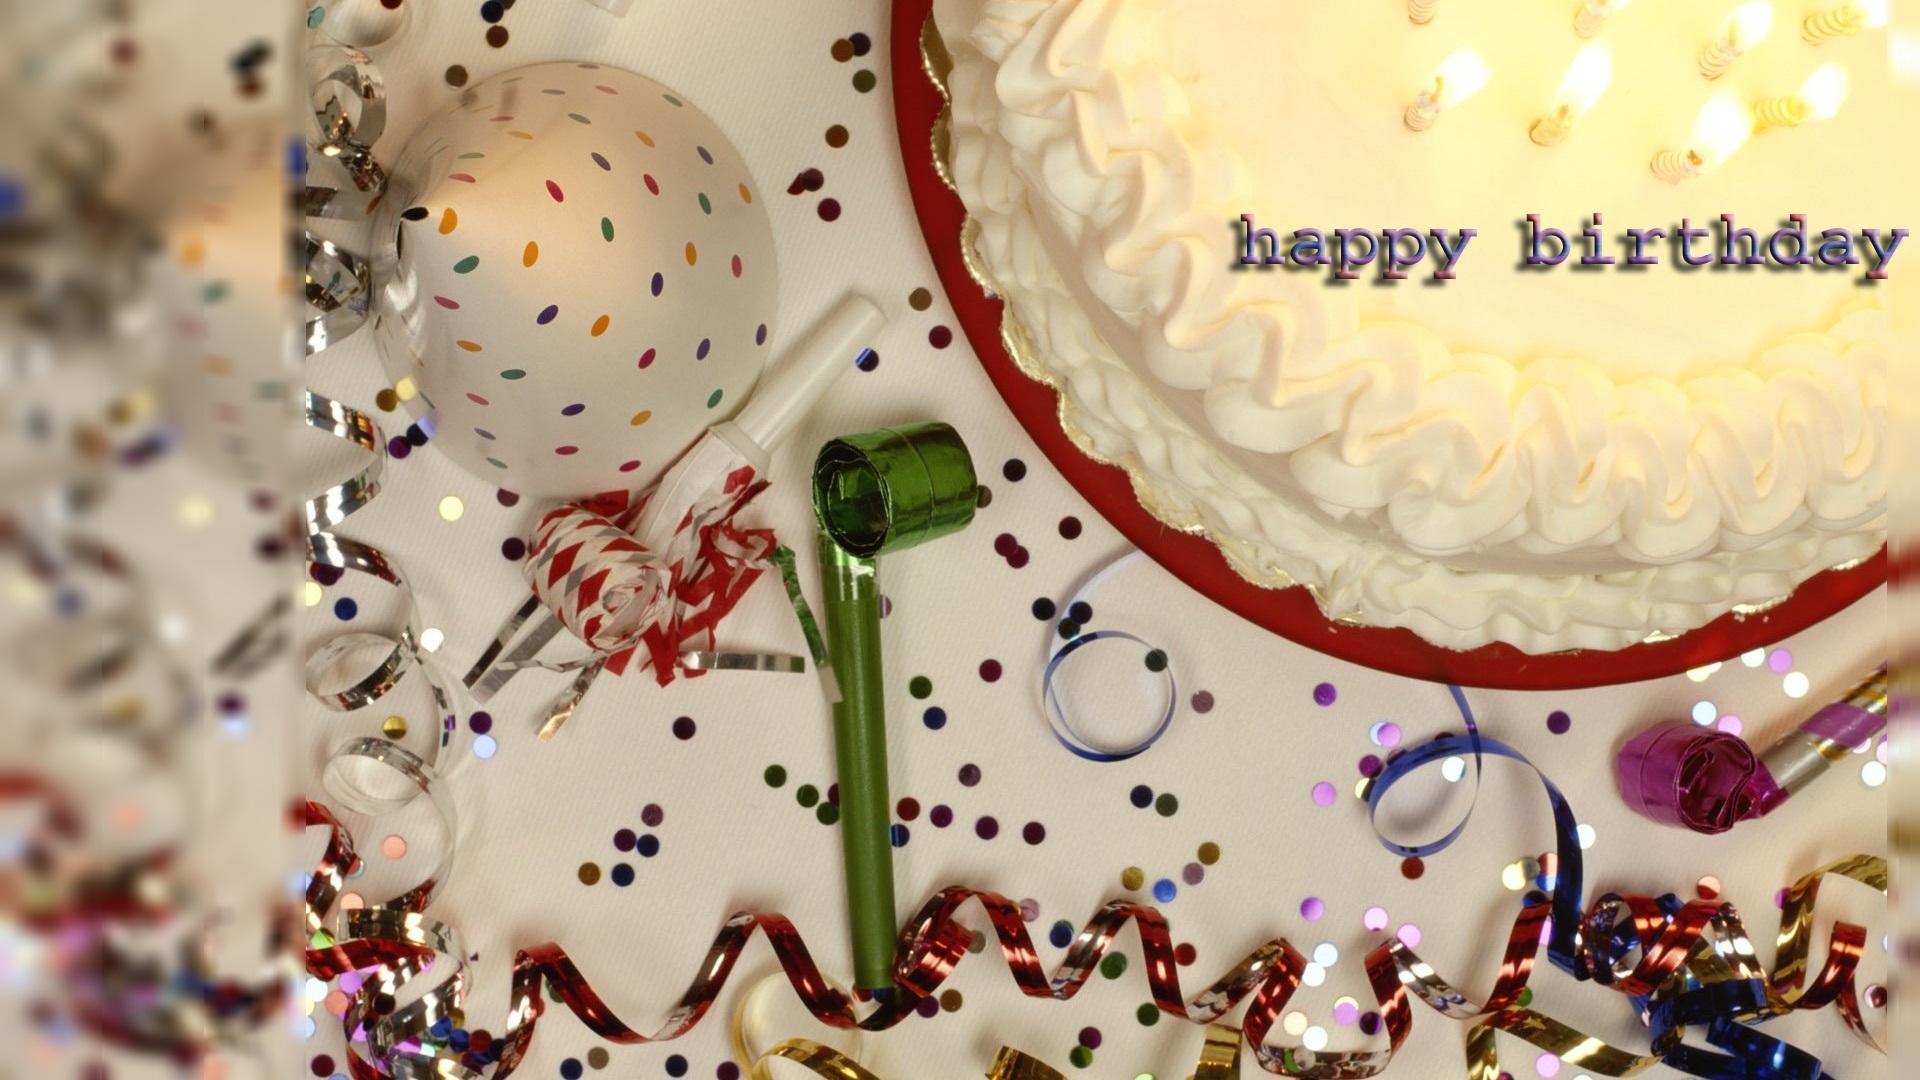 Birthday Cake Wallpaper 3d Happy Birthday Cake Pictures Pixelstalk Net